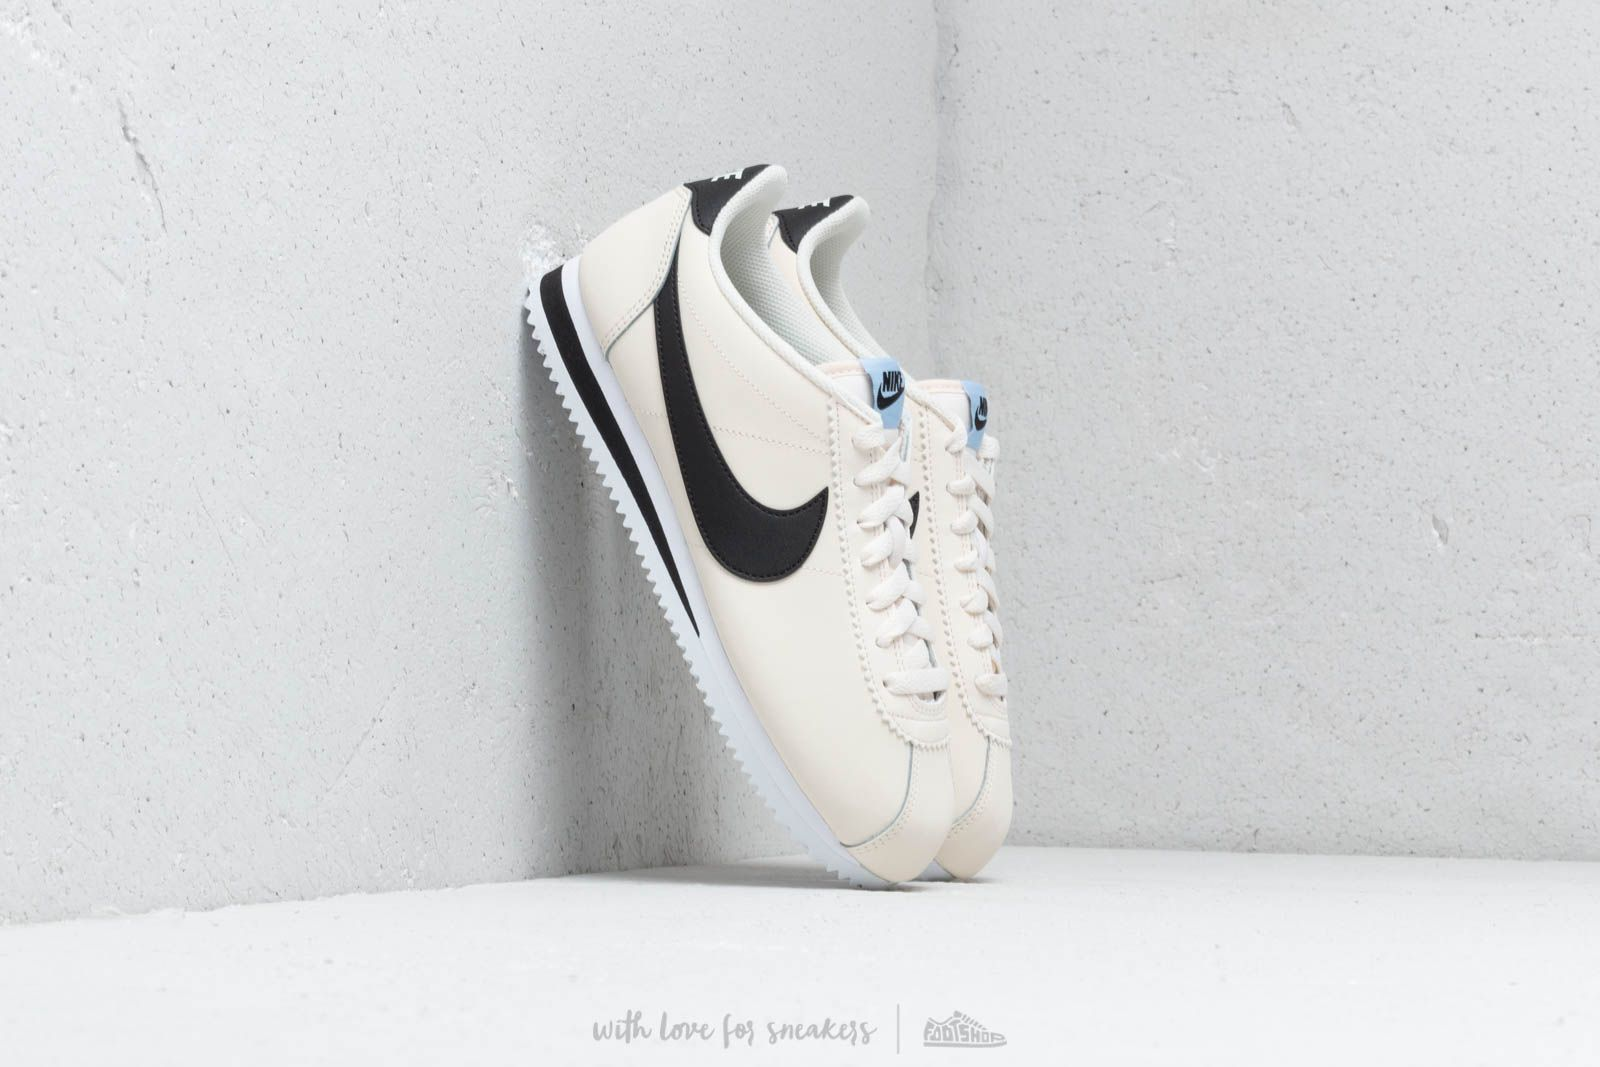 Dámske topánky a tenisky Nike Wmns Classic Cortez Leather Pale Ivory/ Black-Aluminum-White